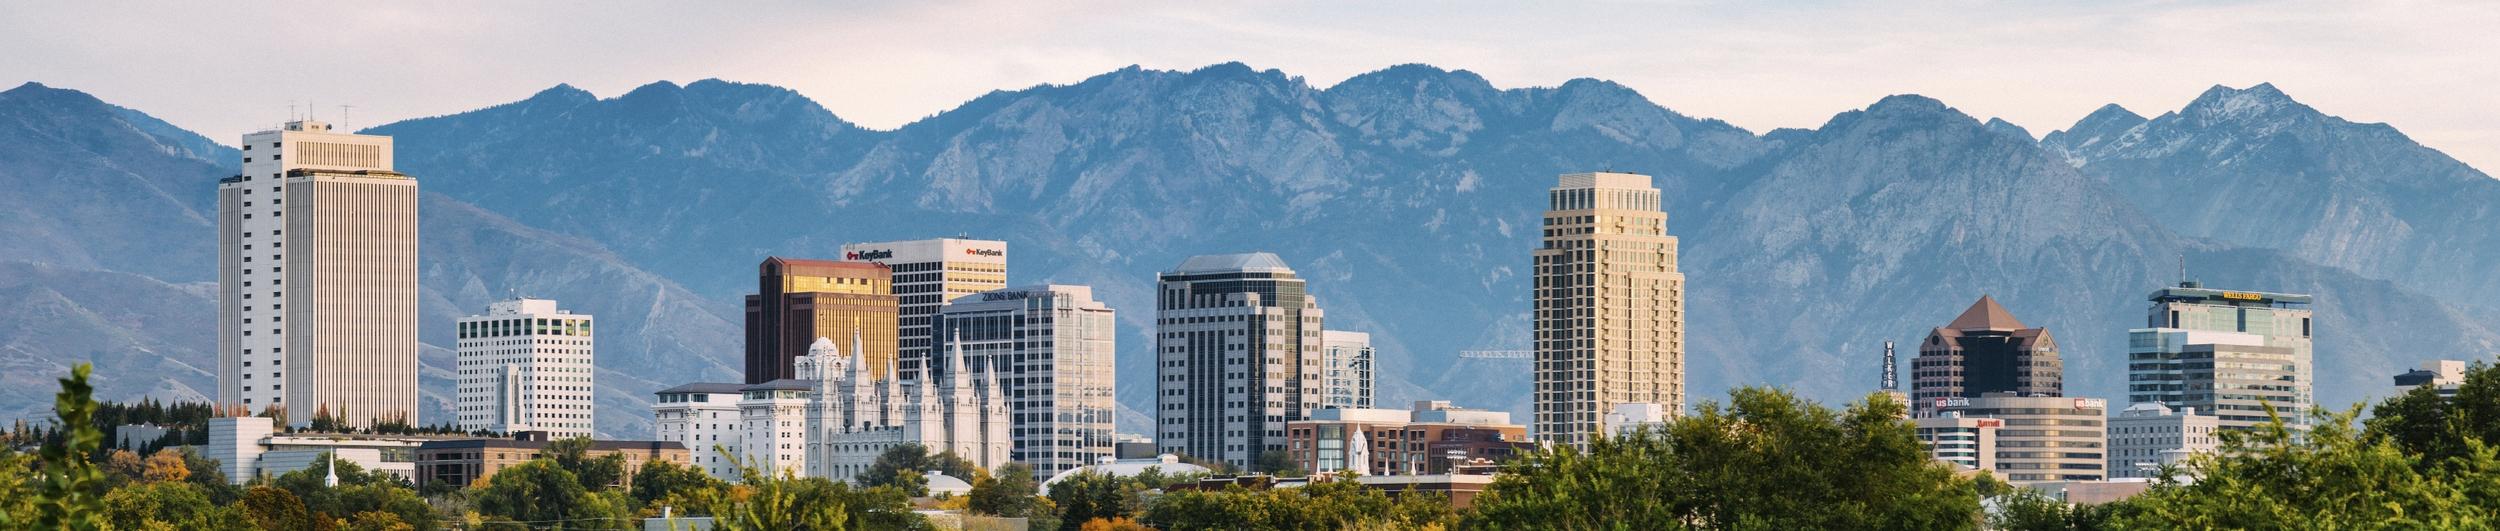 Top Salt Lake City Advertising Marketing and Web Design Agency